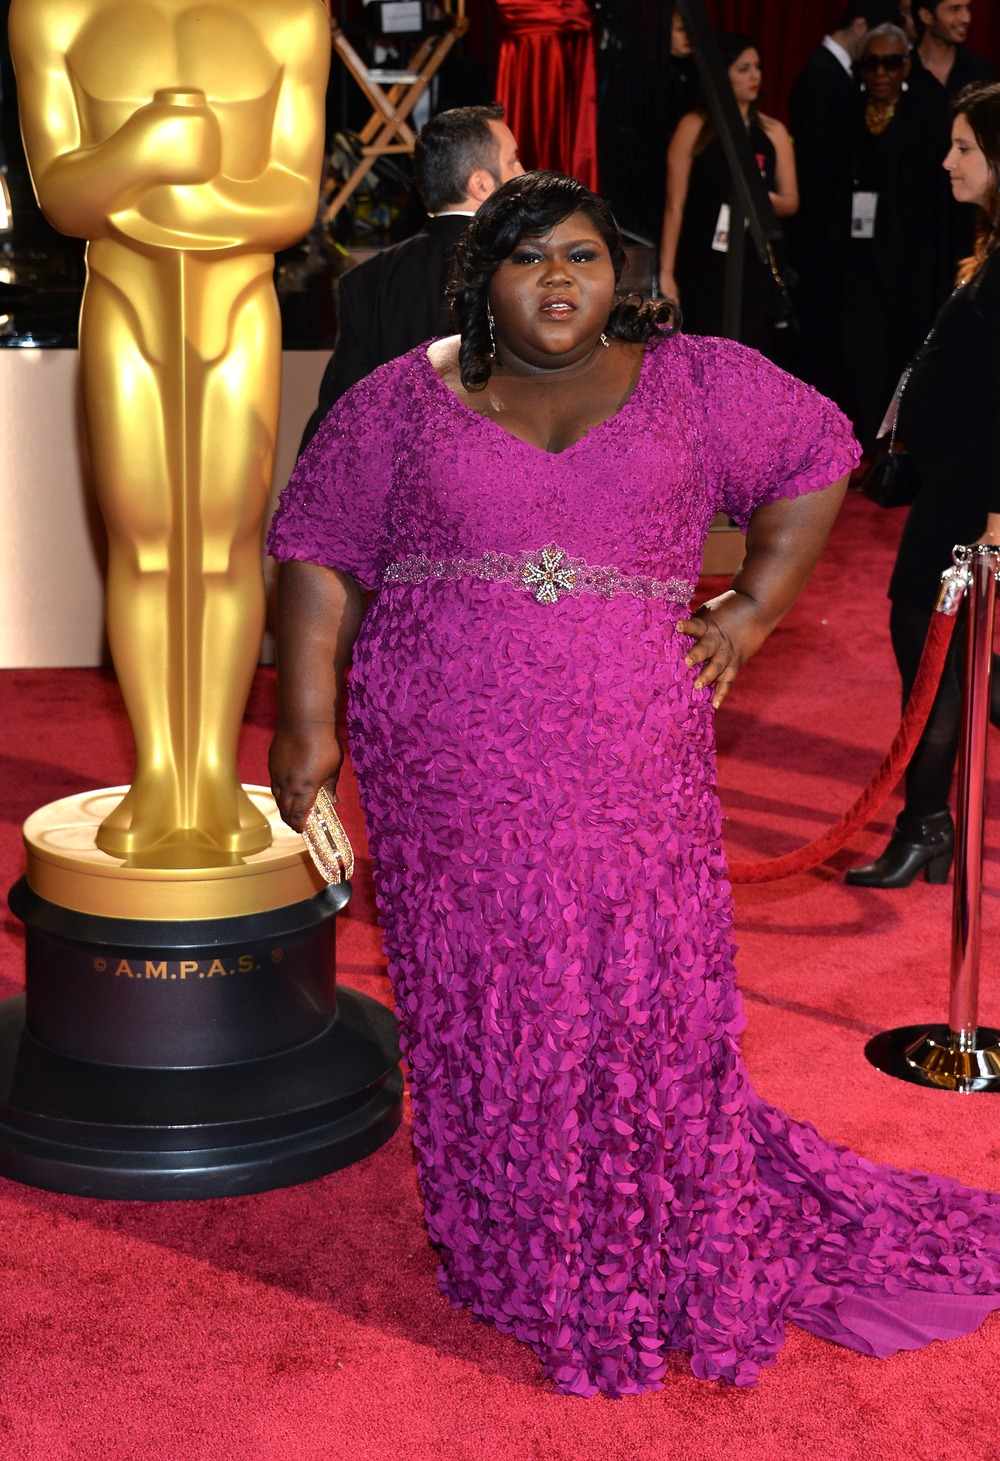 Oscars 2014: Gabourey Sidibe Stuns in Purple on the Red Carpet (PHOTO)